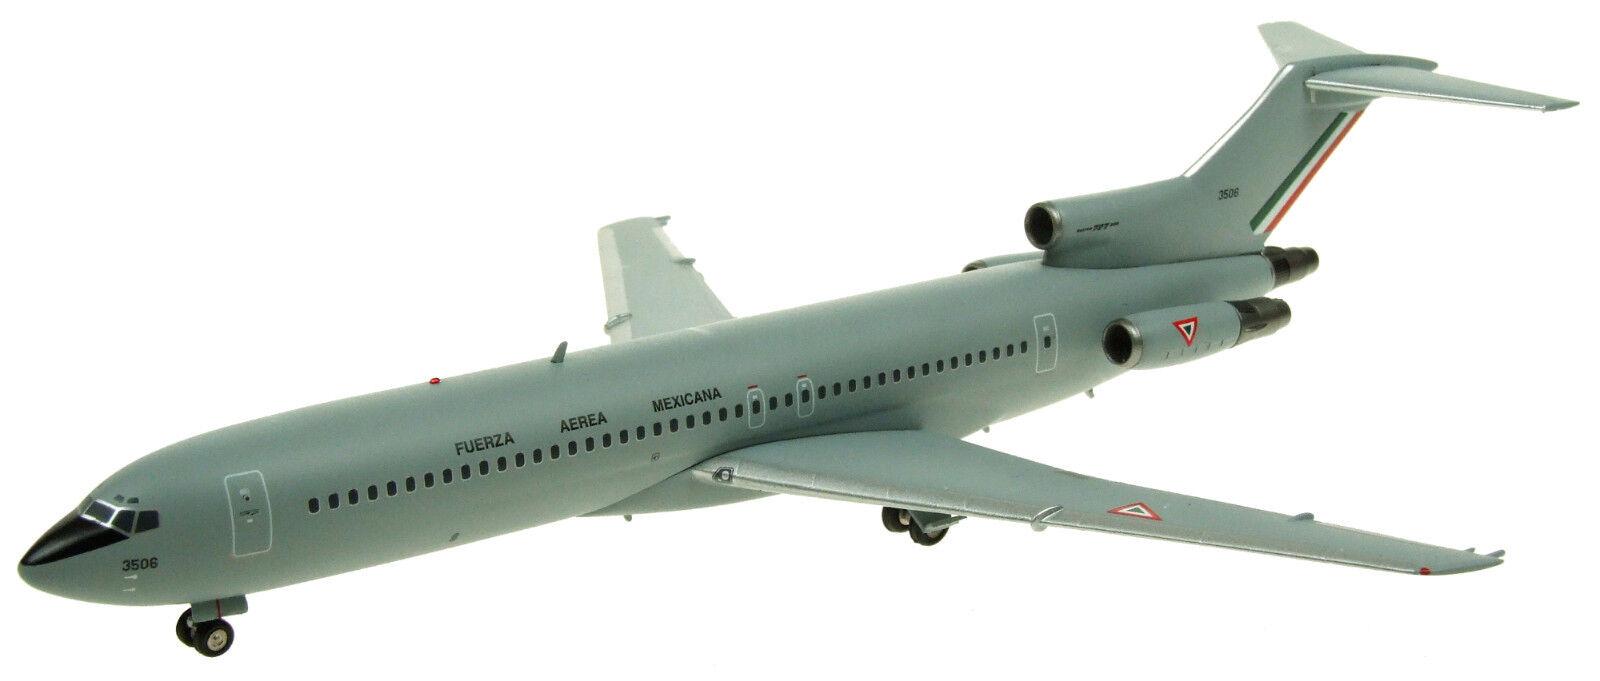 Inflight 200 IF722MAF002 1/200 México fuerza aérea Boeing 727-200 3506 con Soporte